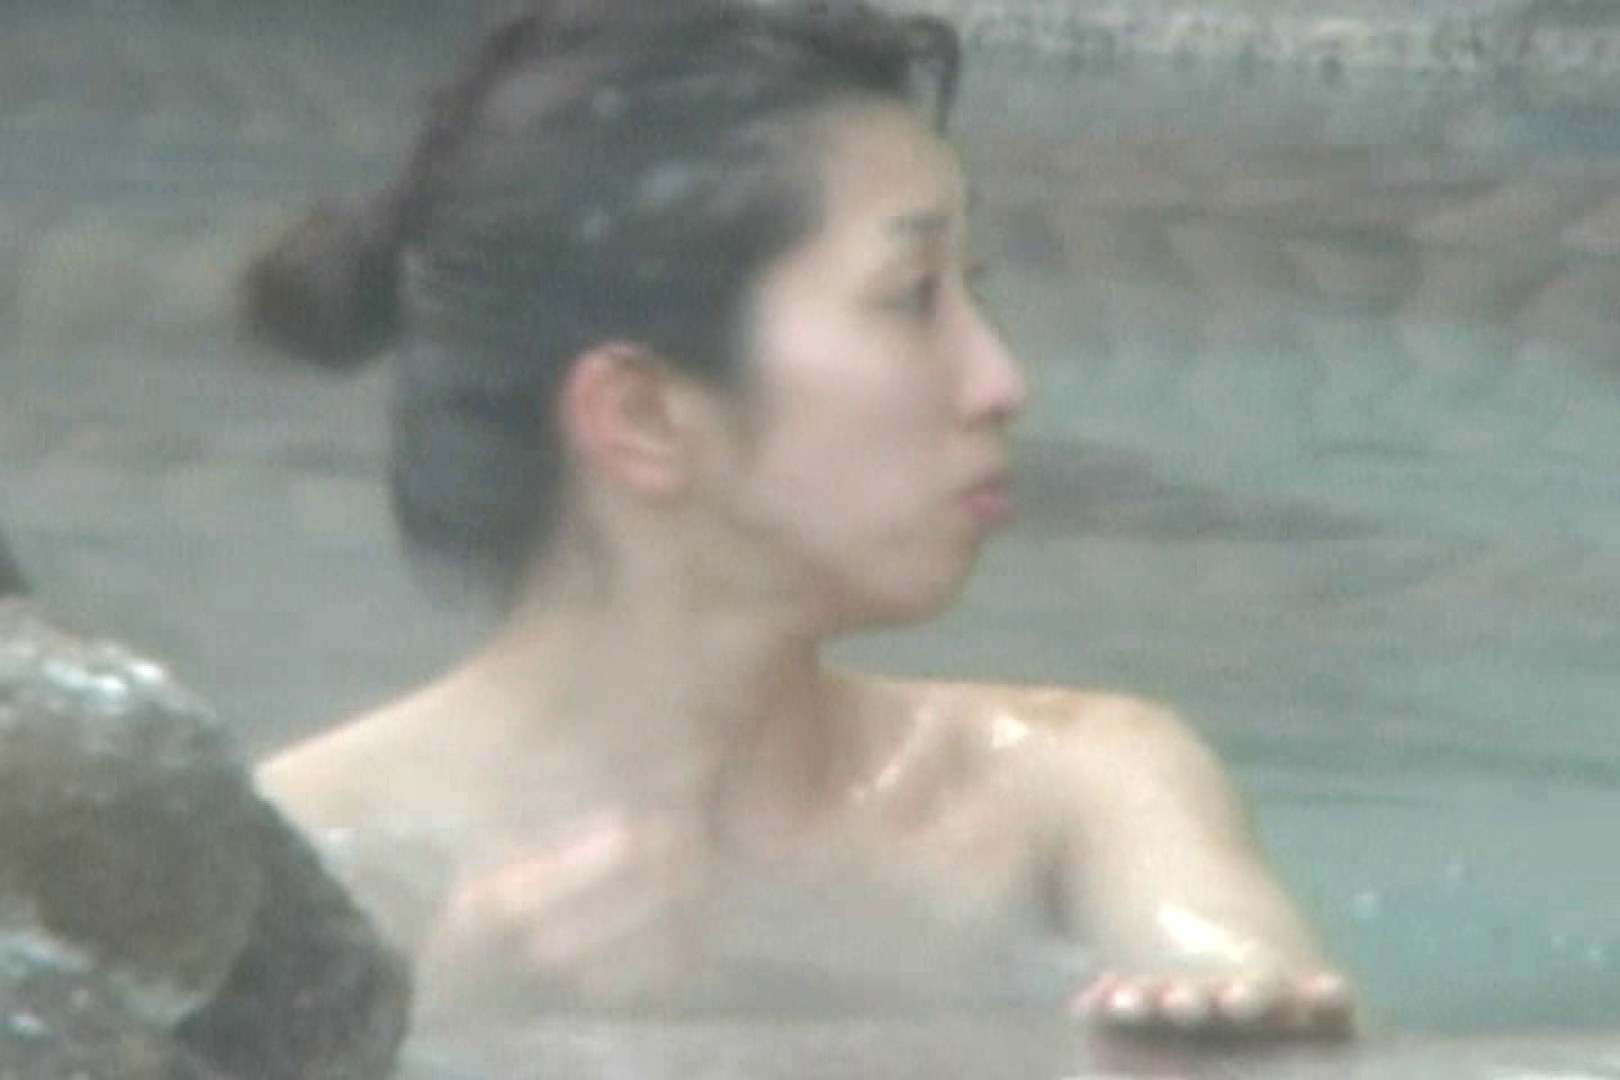 Aquaな露天風呂Vol.588 0   0  41連発 16